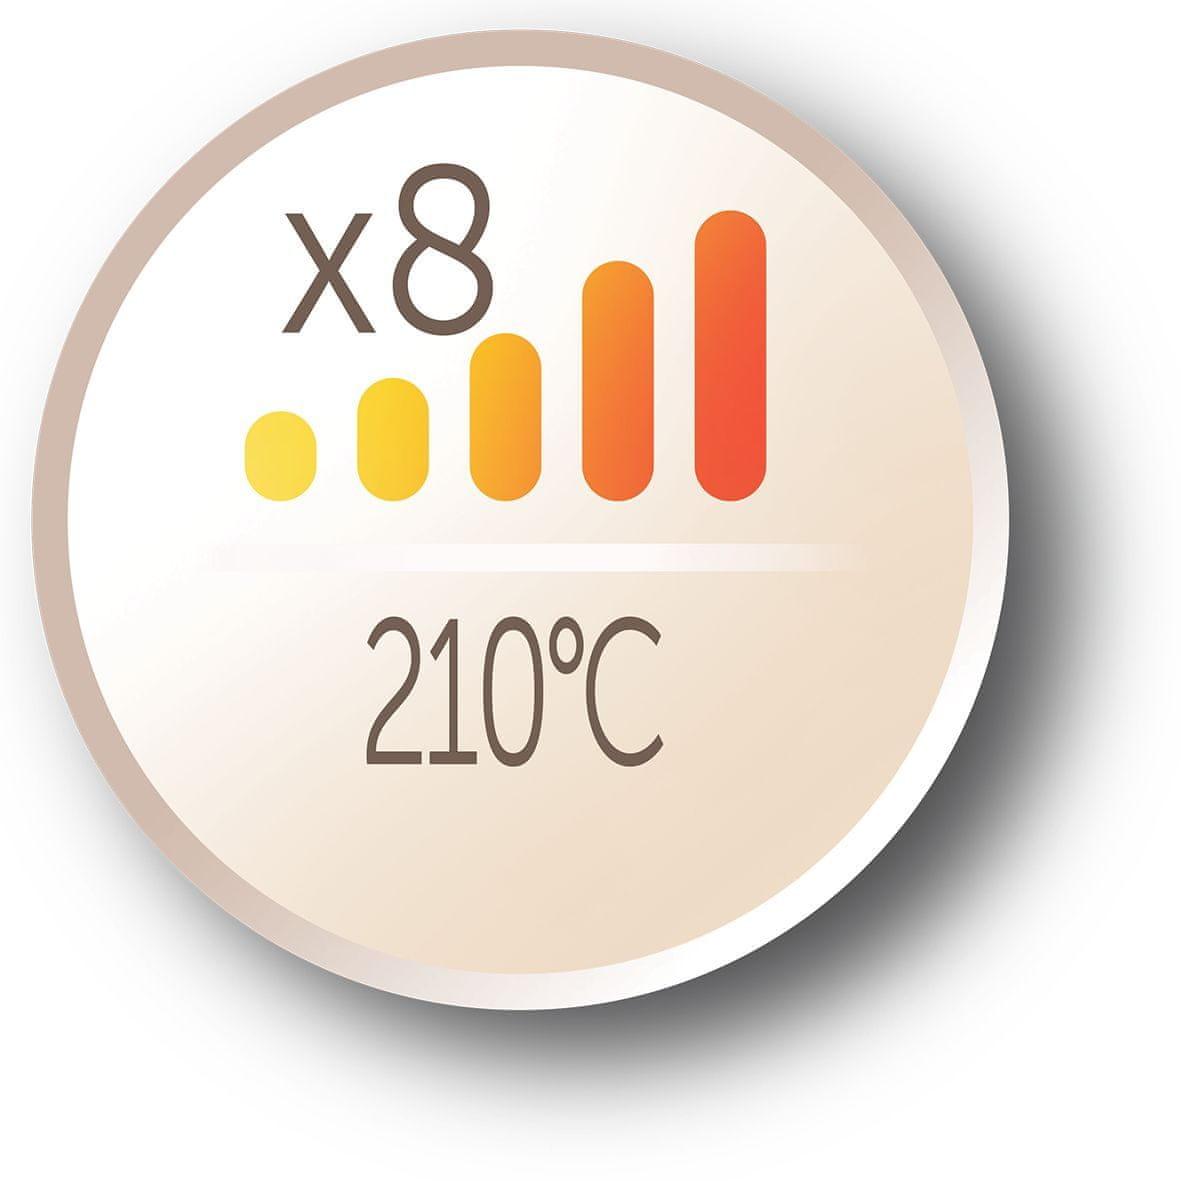 Remington Ci5318 Keratin Protect nastavení teploty